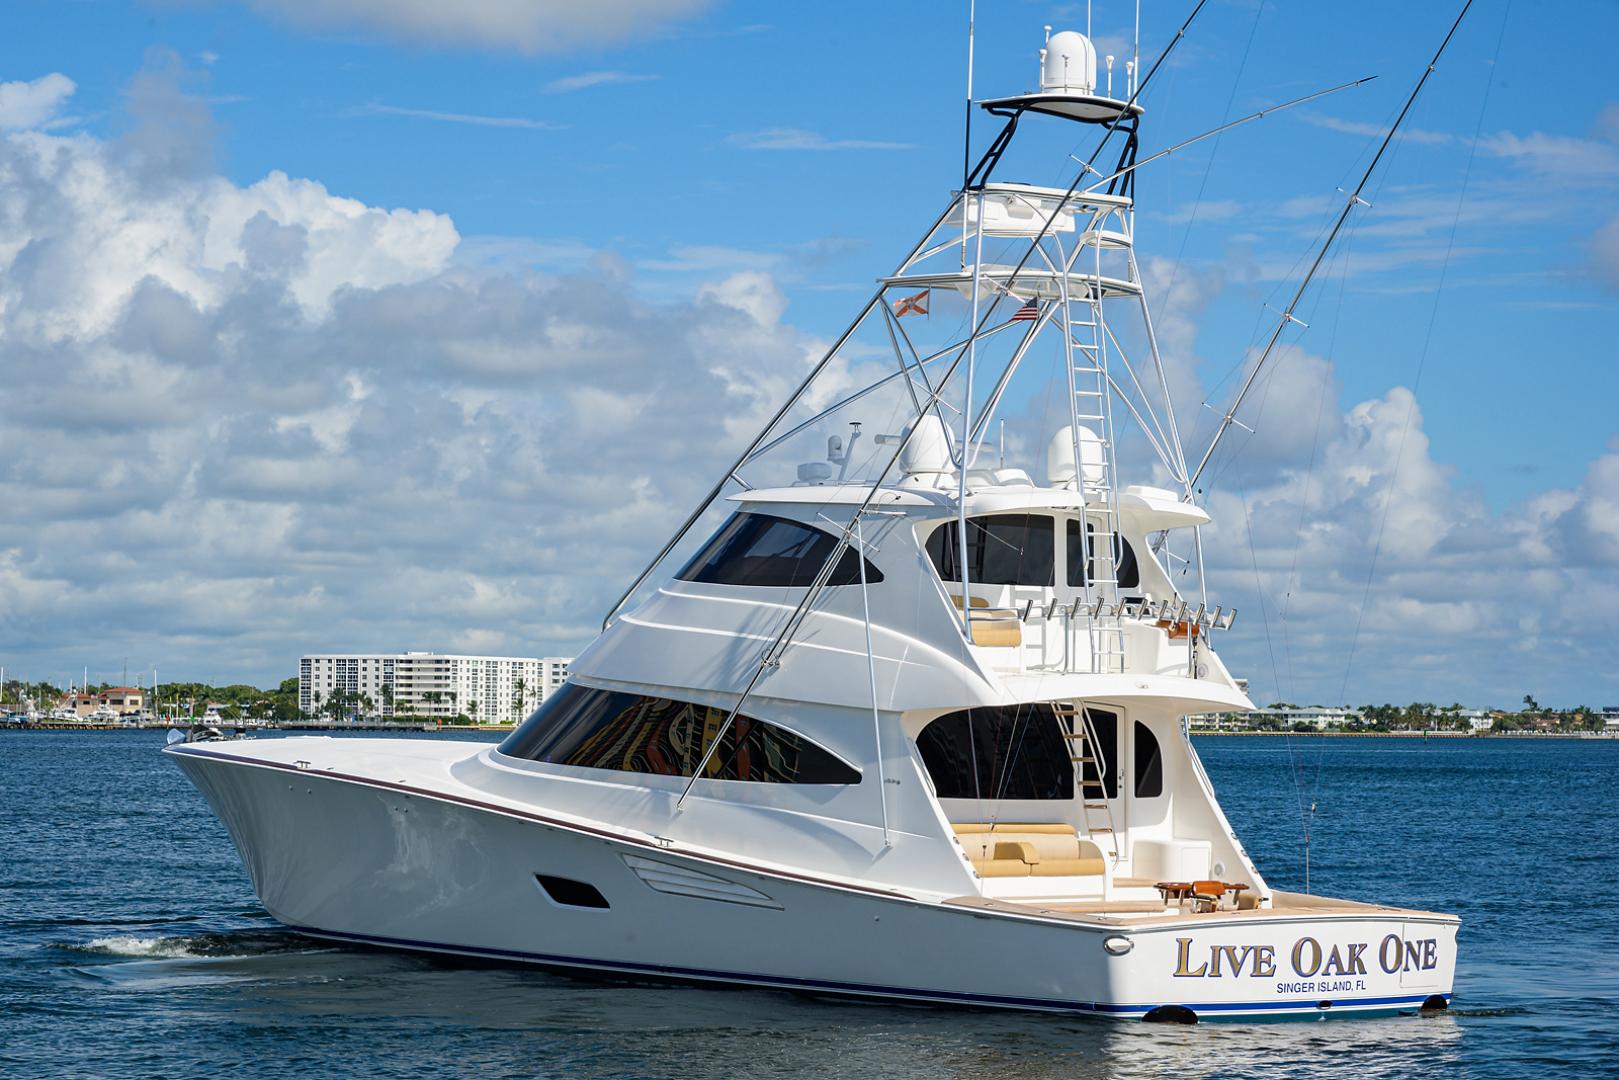 Viking-Enclosed Bridge 2016-LIVE OAK ONE Singer Island-Florida-United States-LIVE OAK ONE-1510984   Thumbnail